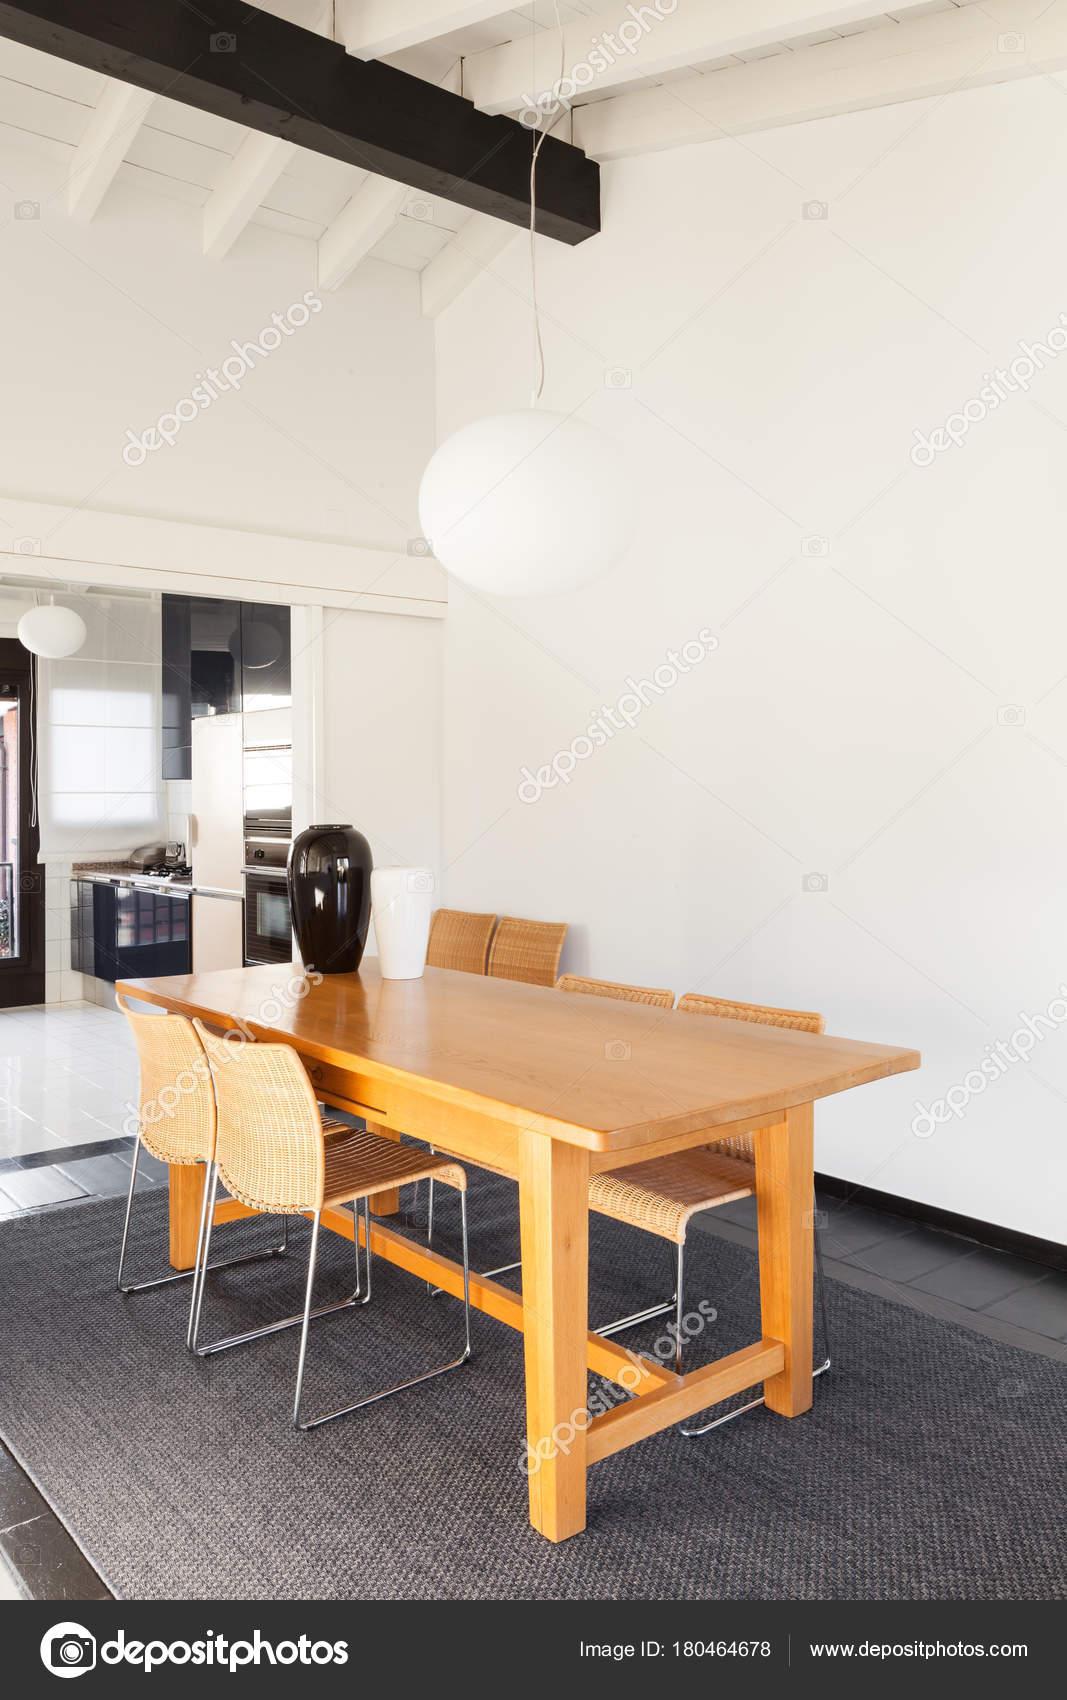 wohngebaude komfortable loft moderne mobel esstisch stockfoto